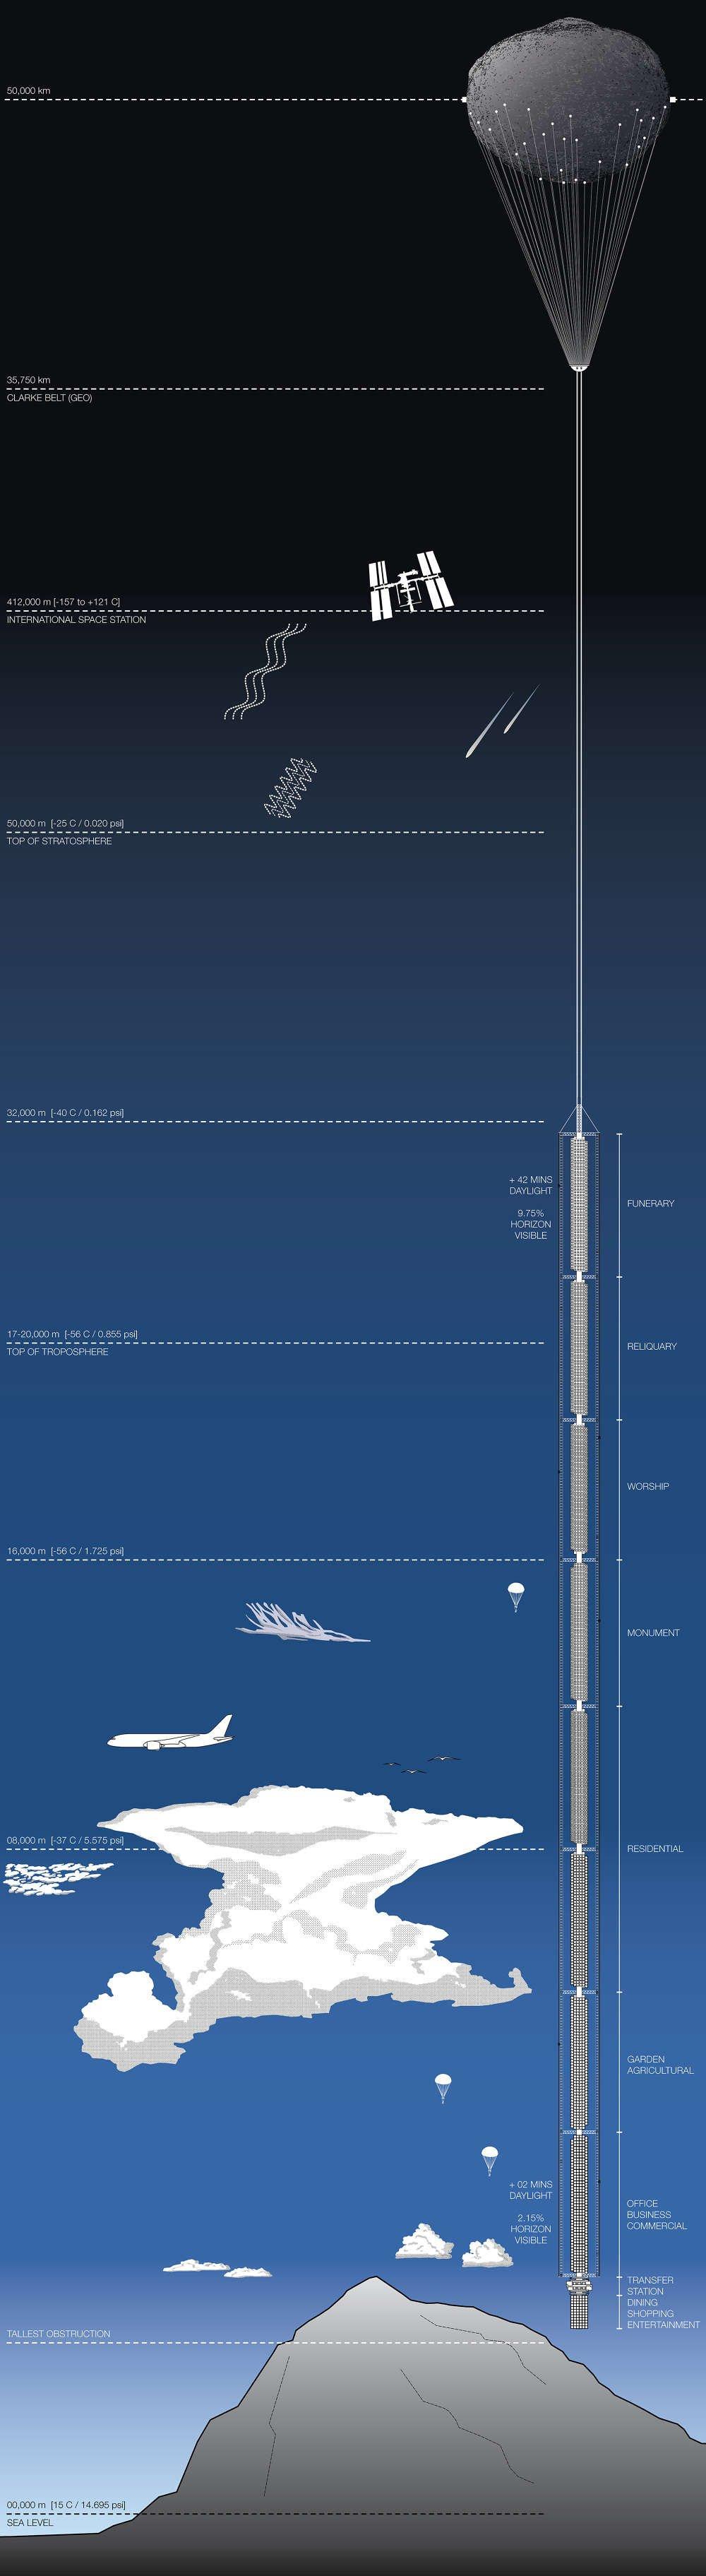 arranha-ceus-asteroide-4